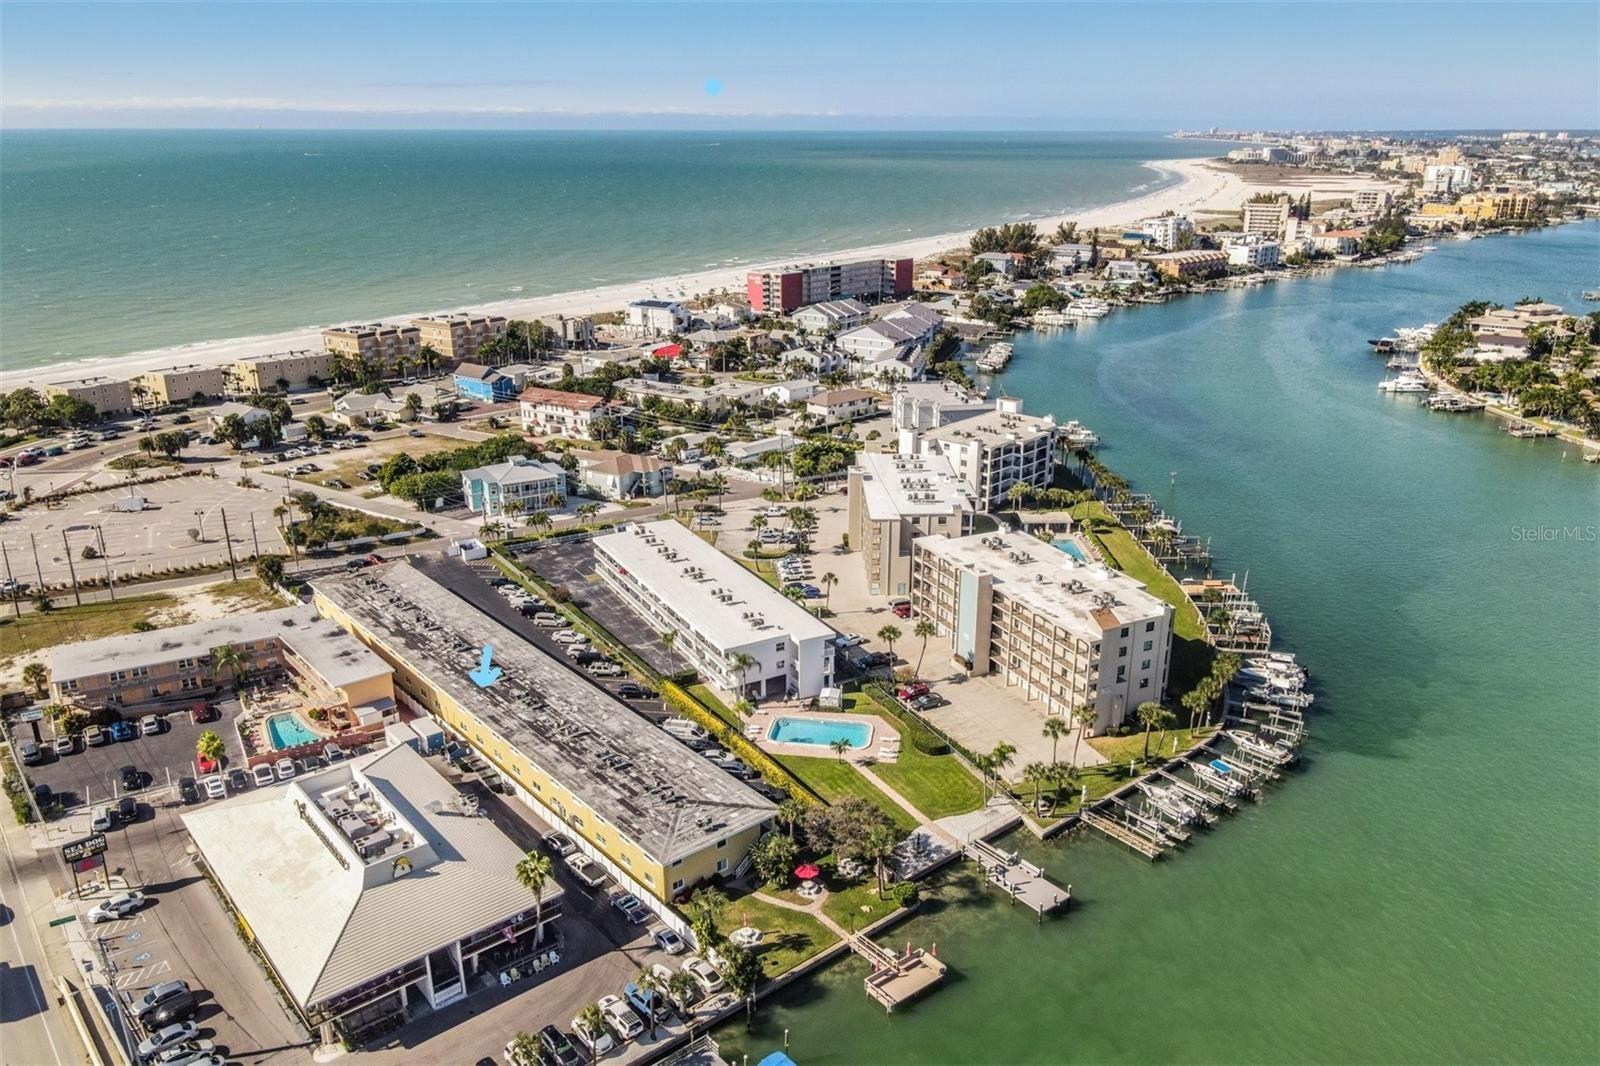 9715 HARRELL AVENUE #31, Treasure Island, FL 33706 - #: U8137981